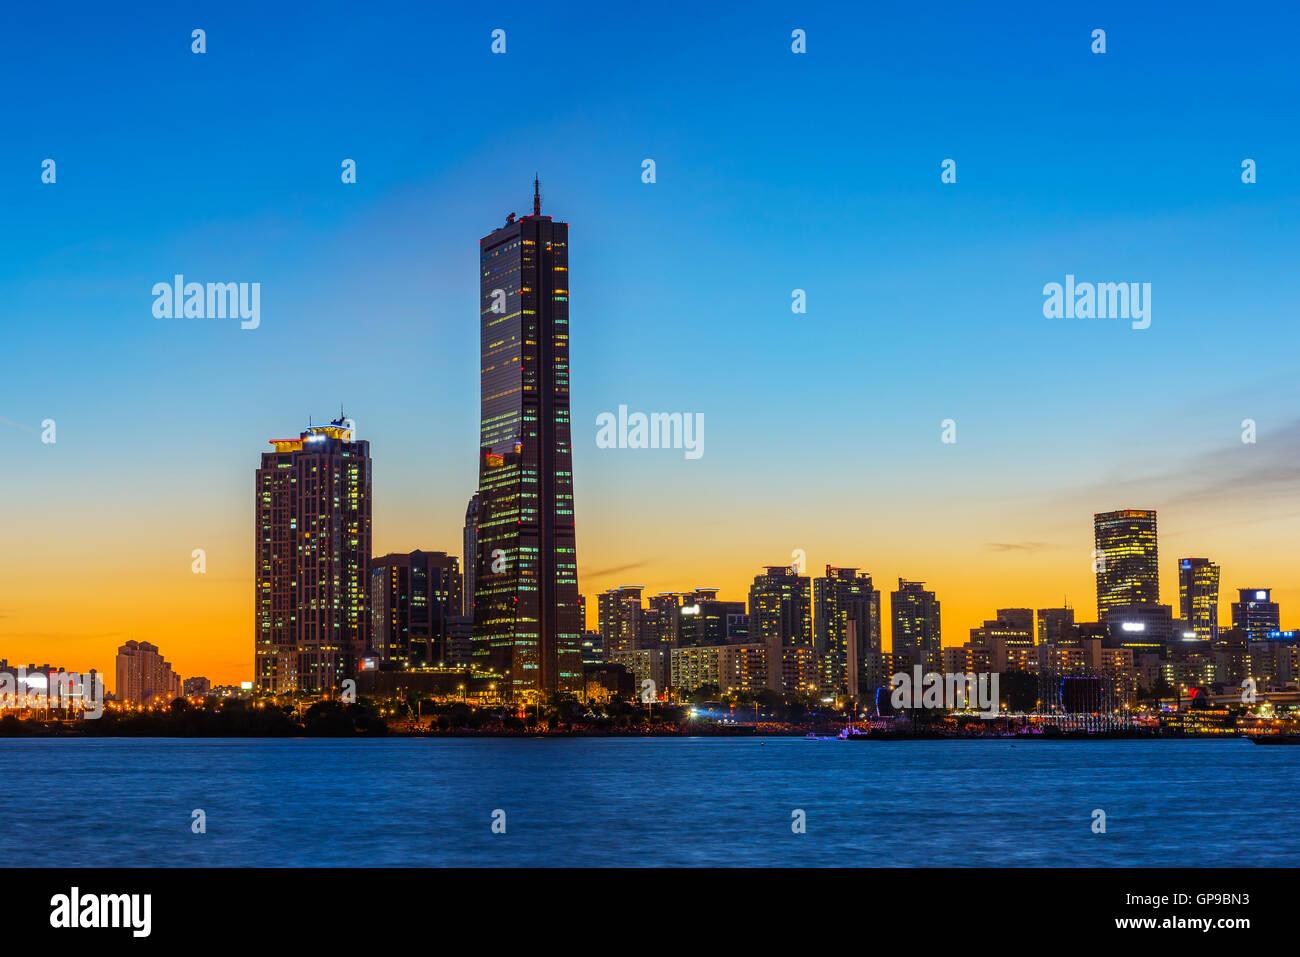 Korea,Seoul at night, South Korea city skyline. - Stock Image